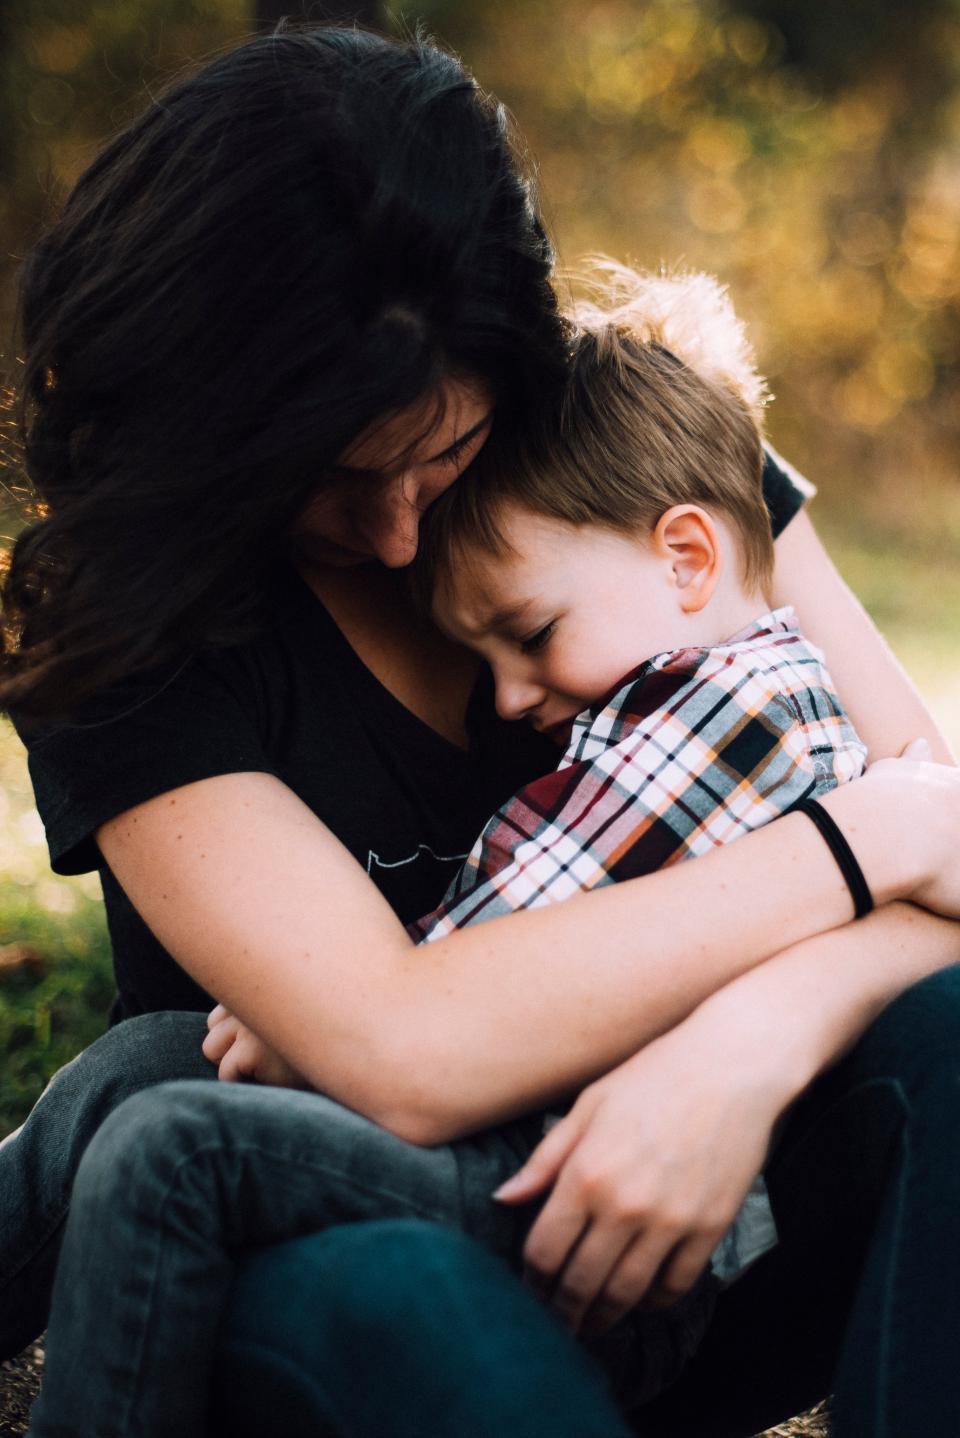 mother, woman, people, kid, baby, child, hug, love, parent, sitting